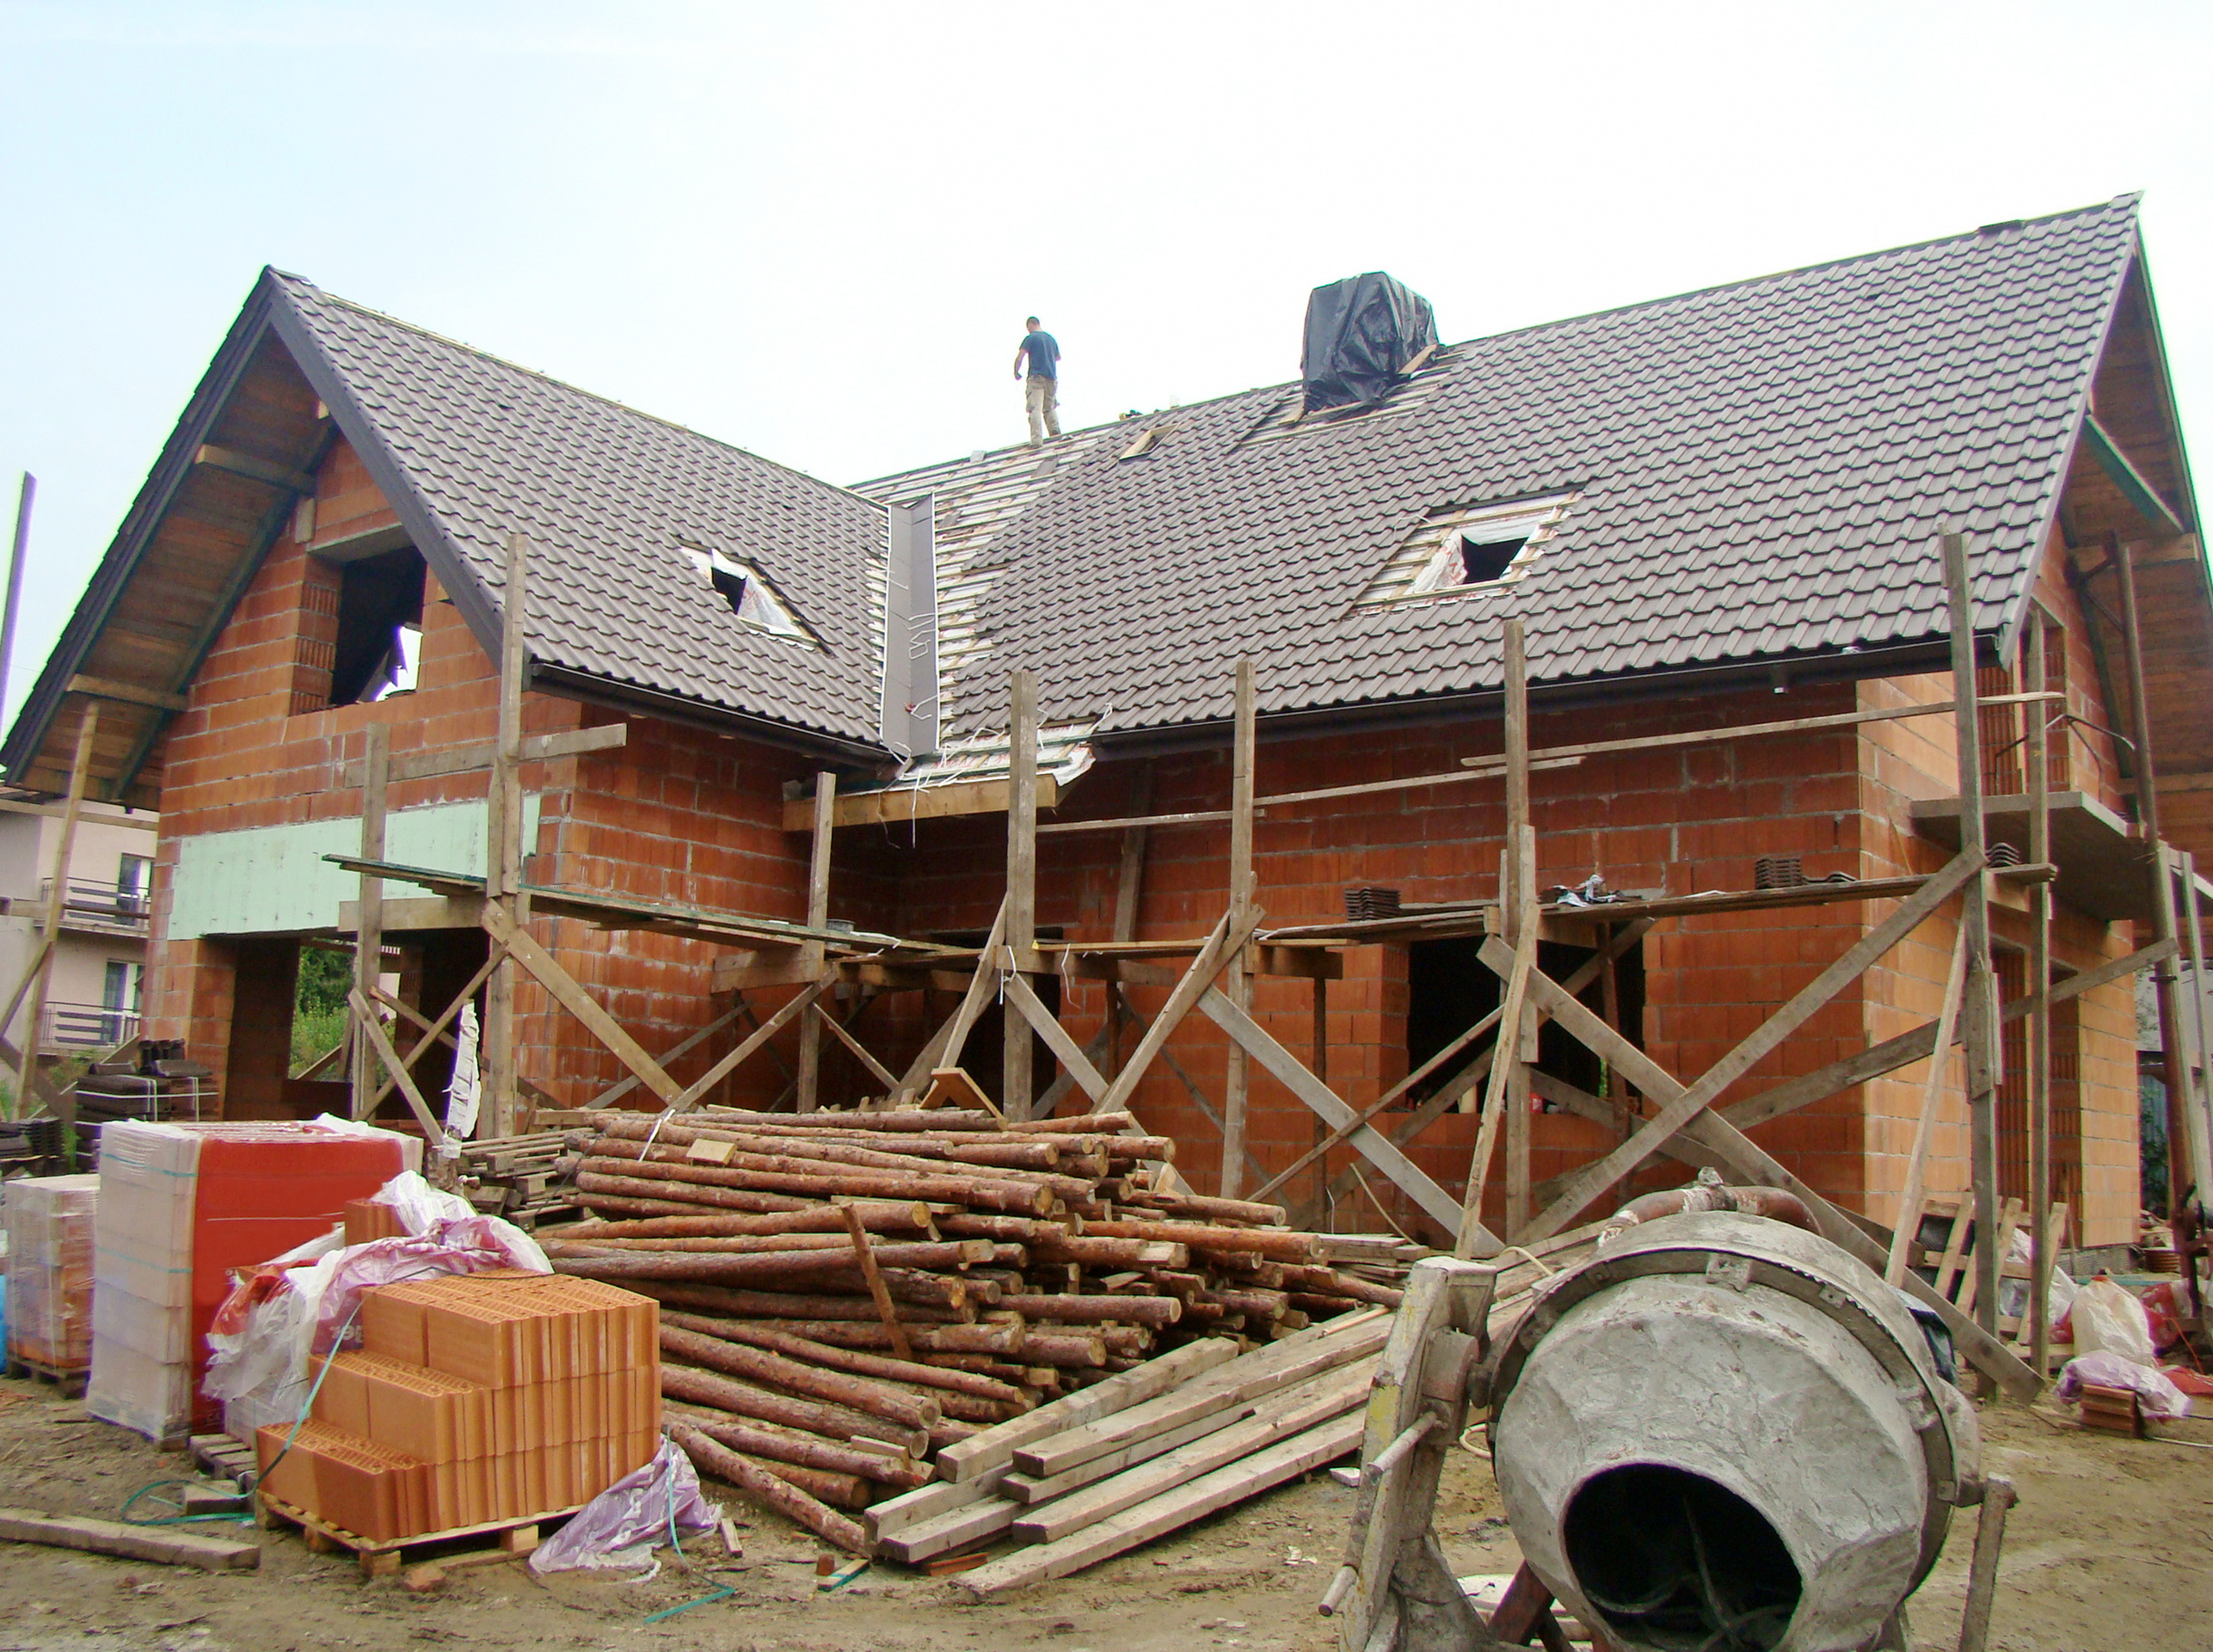 shutterstock_165123551 (Unfinished Building Works)